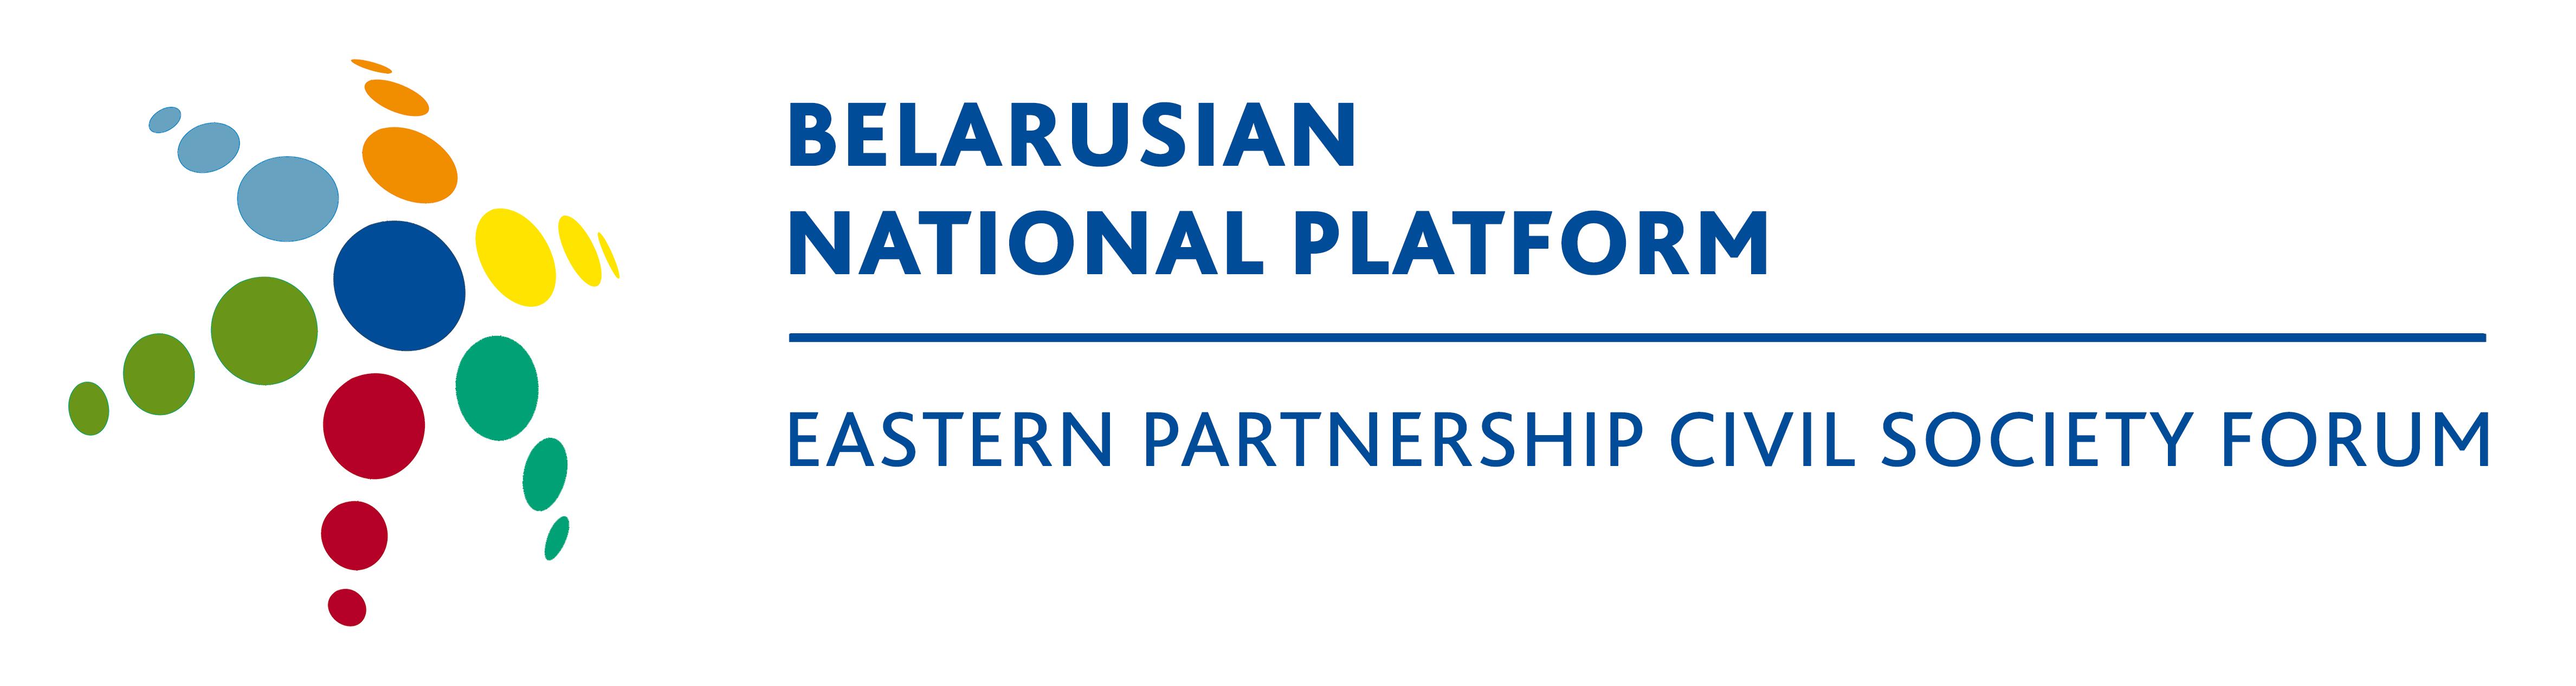 Eastern Partnership Civil Society Forum | National Platform Belarus